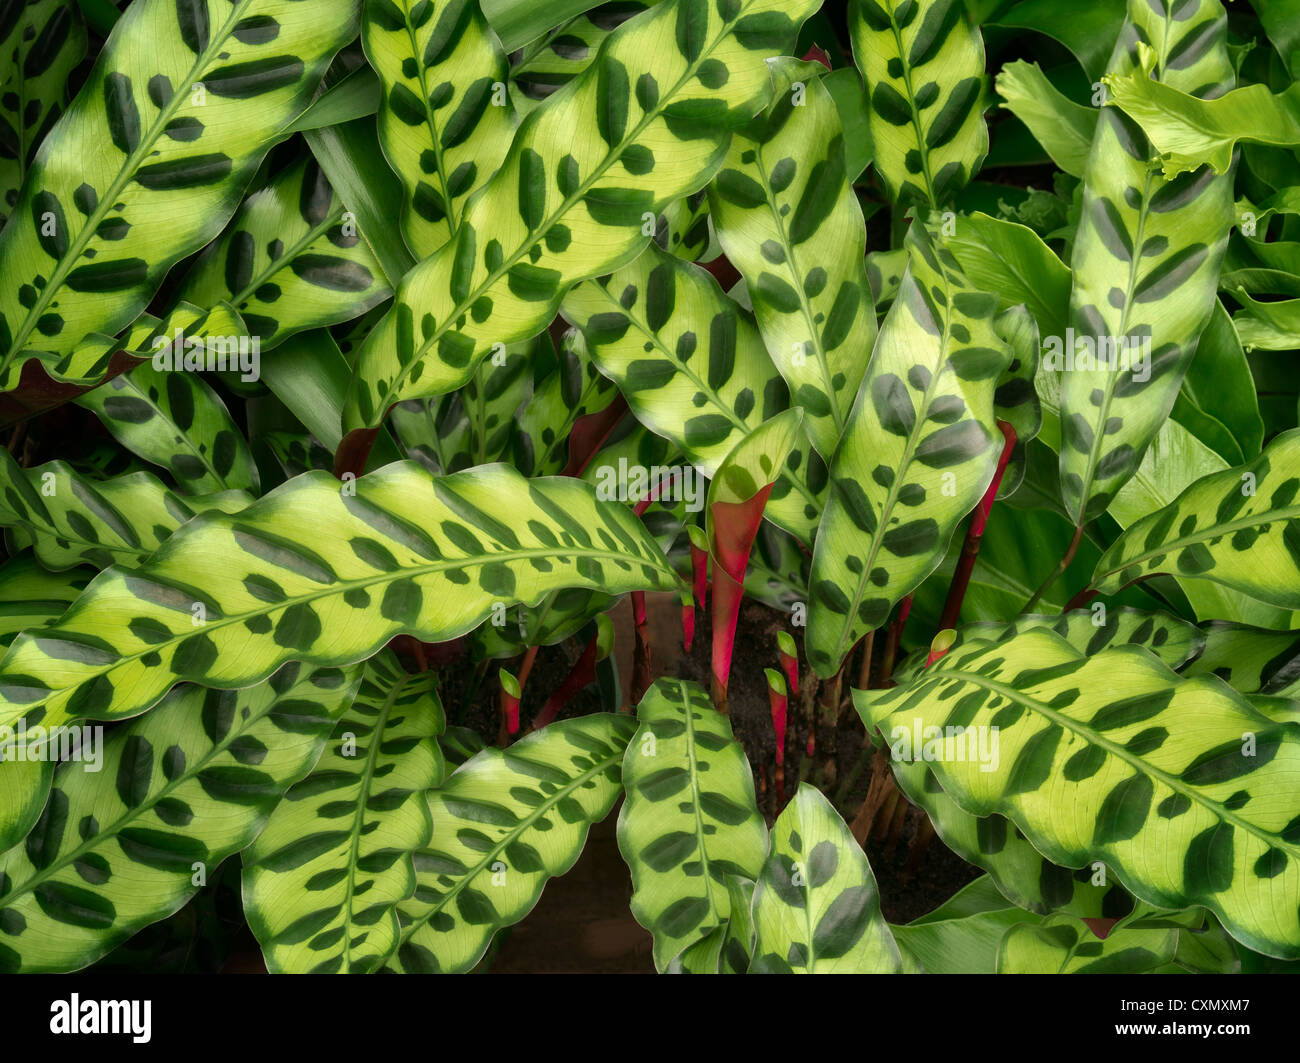 Close up of leaves of dalathea. Oregon - Stock Image